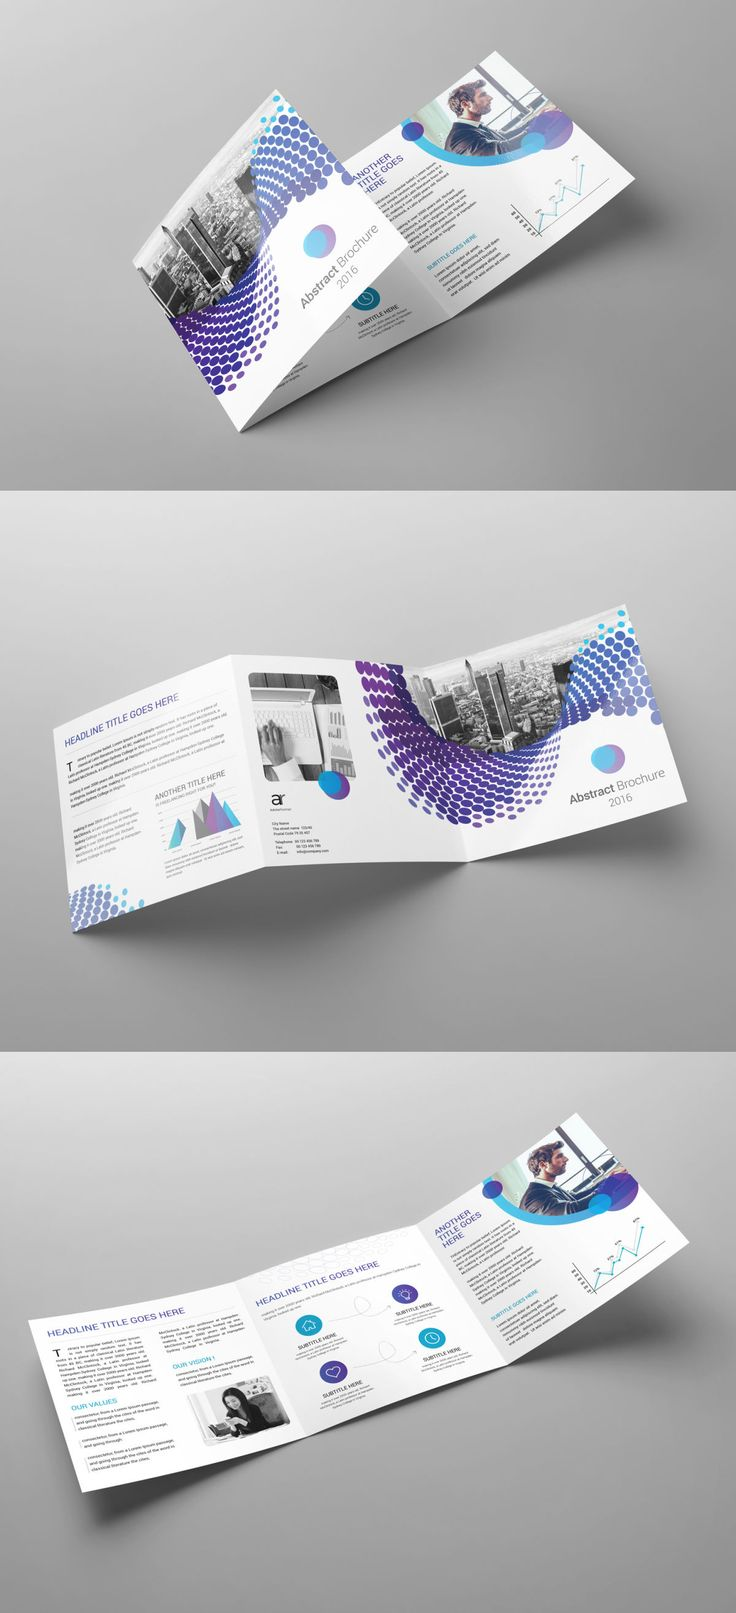 Tri fold square brochure template indesign indd brochure for Free tri fold brochure template indesign